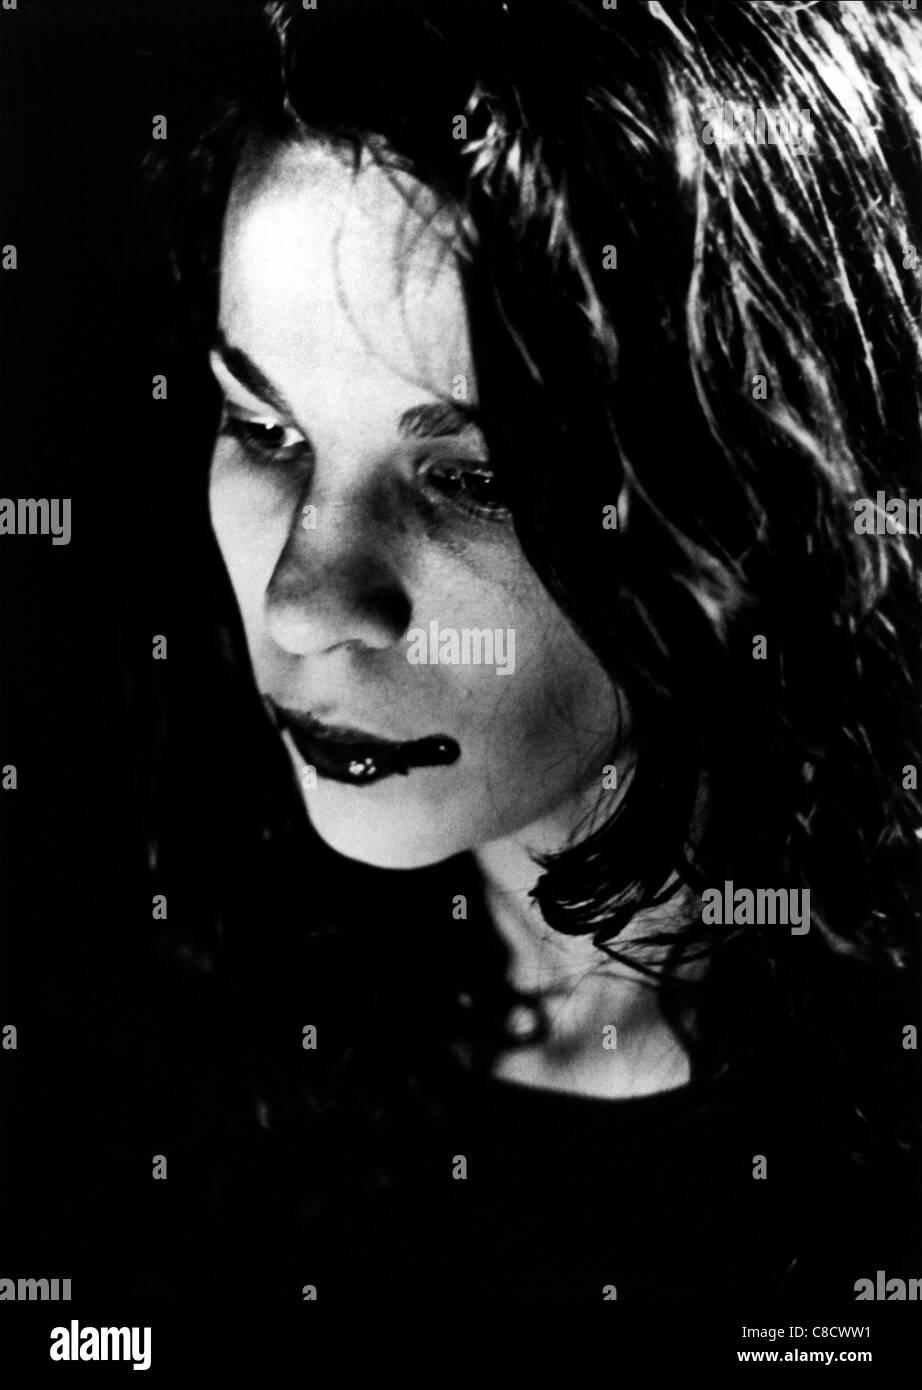 LILI TAYLOR THE ADDICTION (1995) - Stock Image